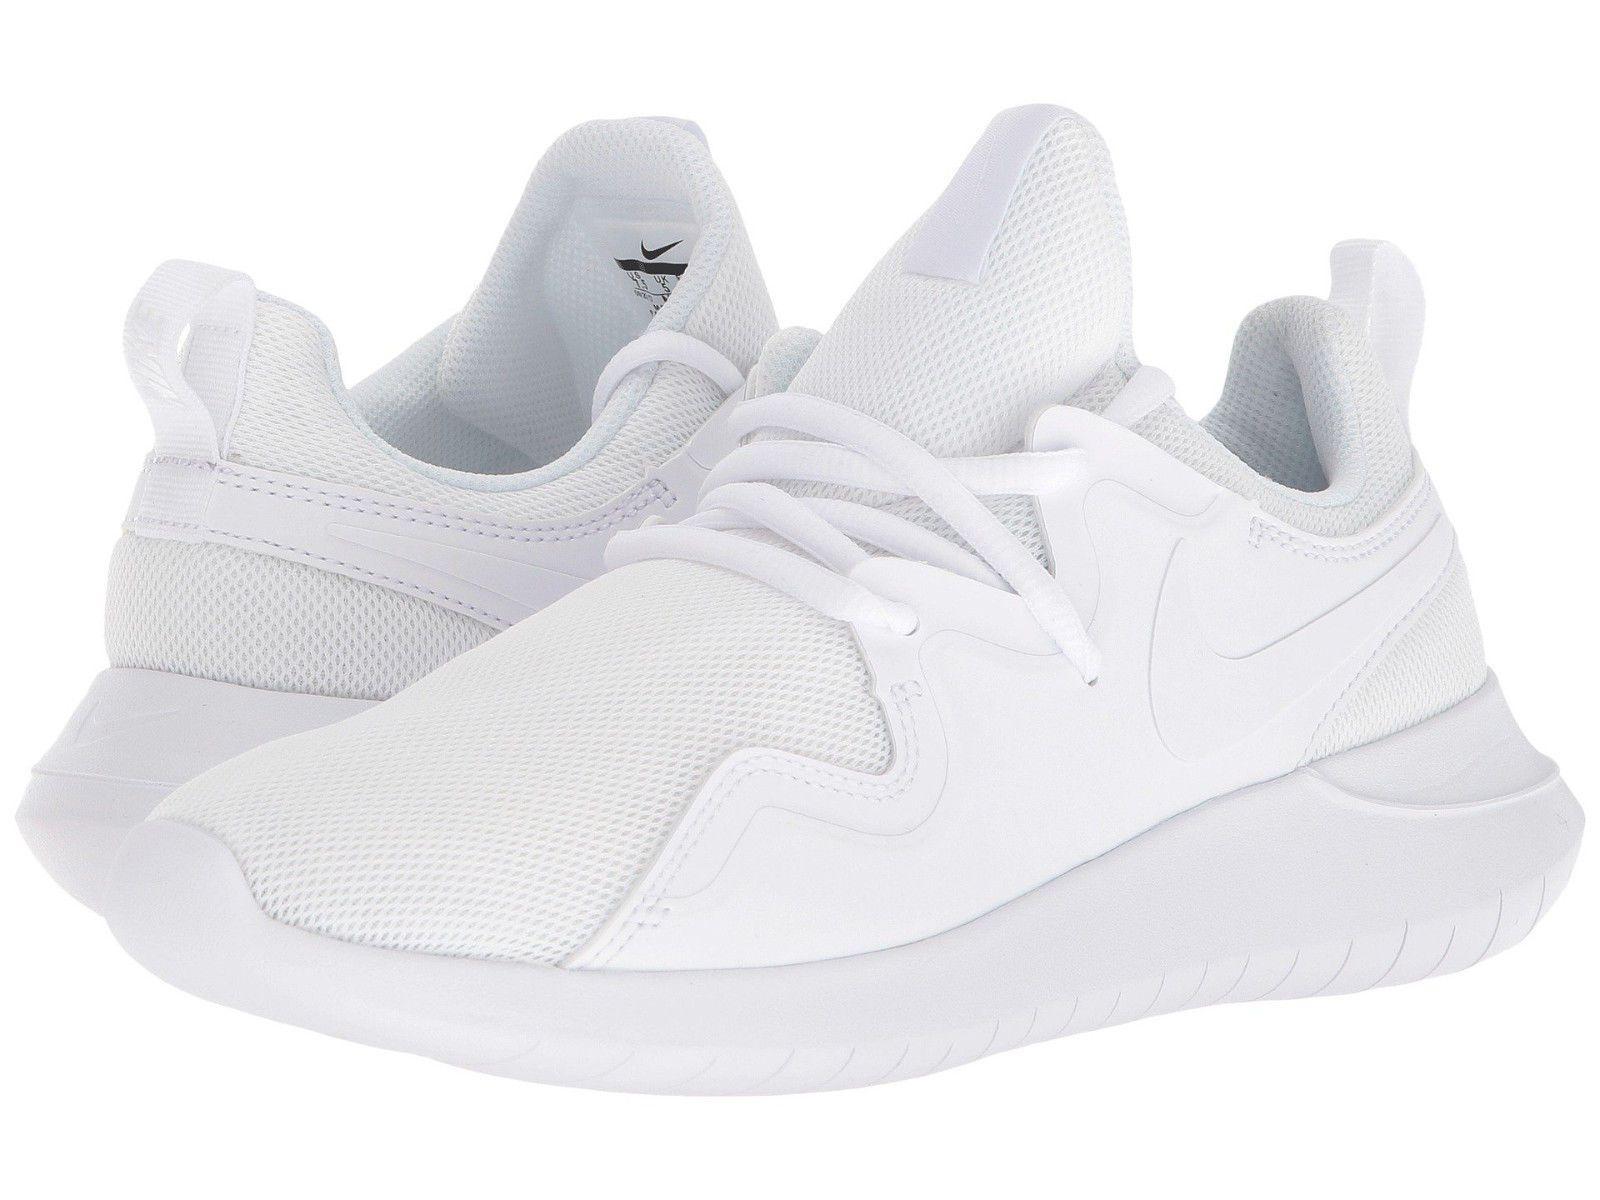 Nike TESSEN Womens White AA2172 100 Lightweight Athletic Running Training  Shoes  44.76  womens  nike 0740936ba